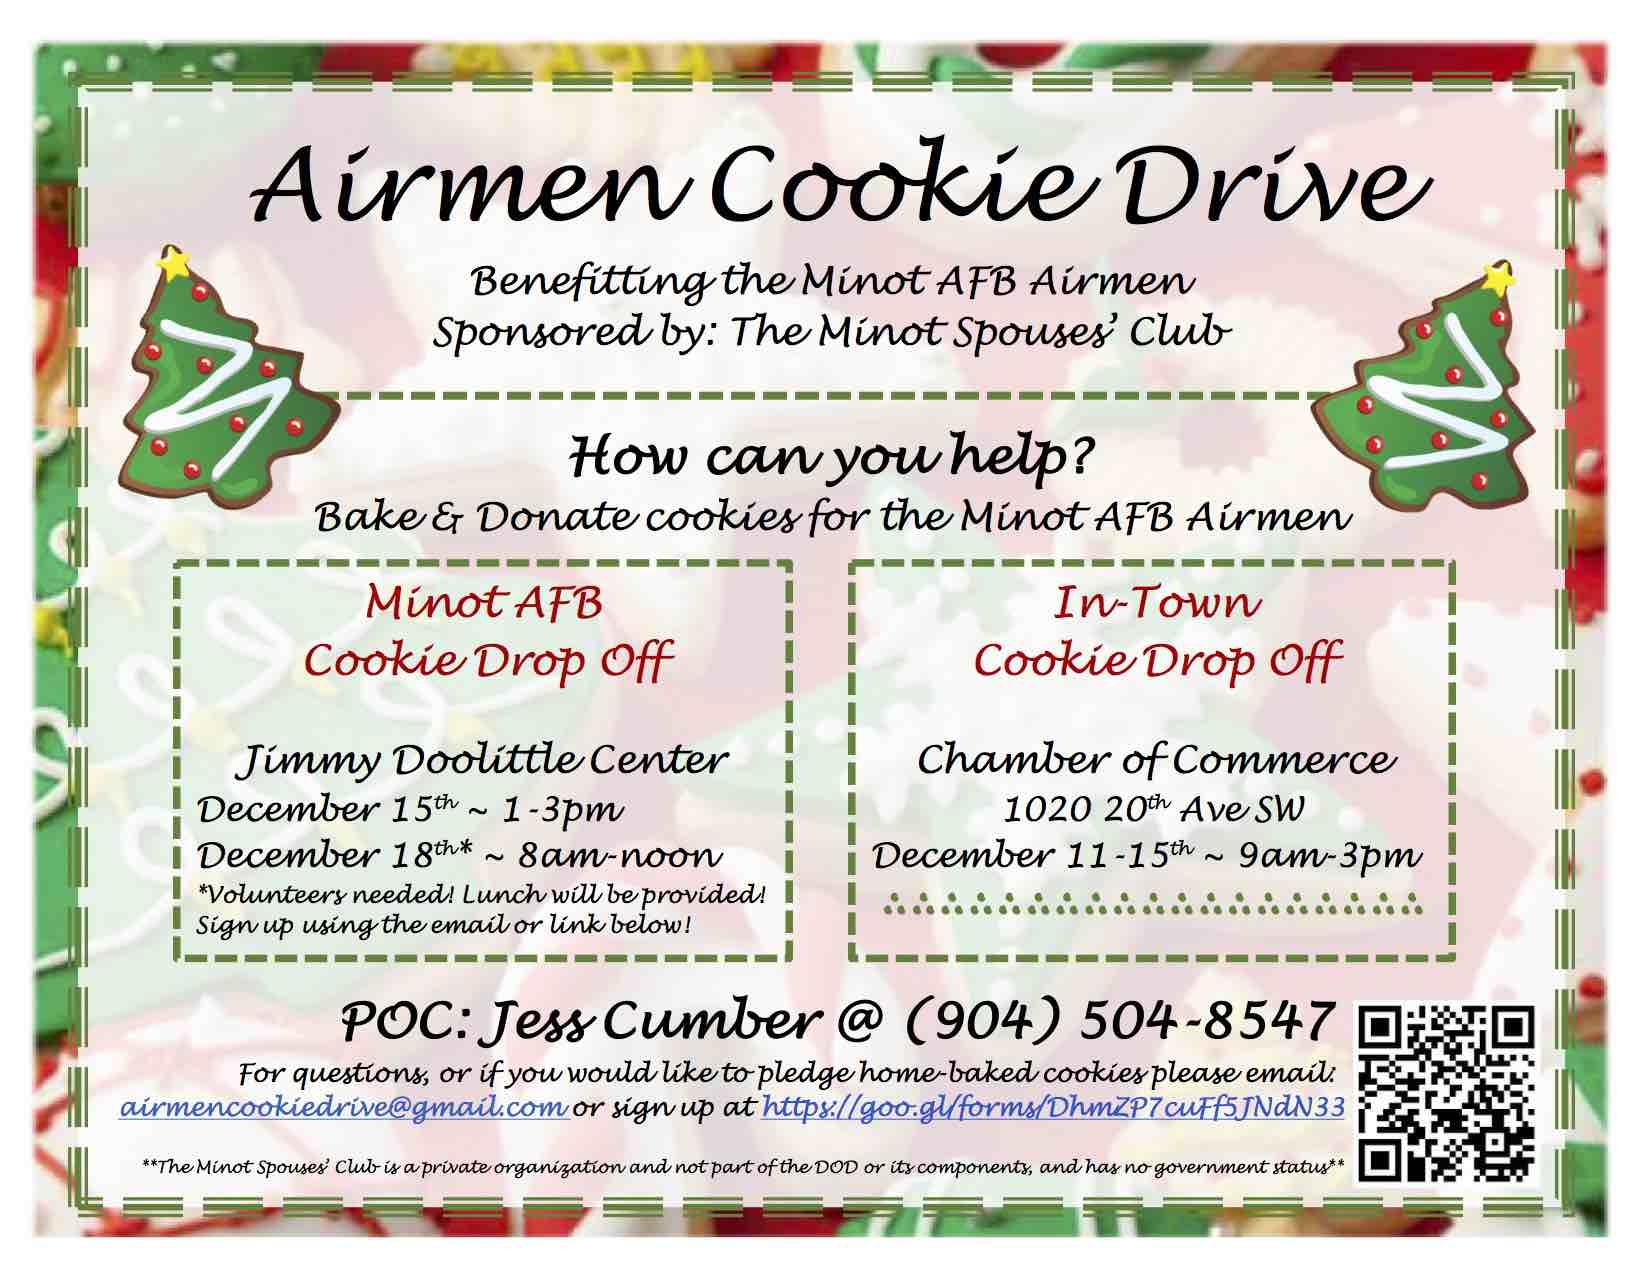 Airmen Cookie Drive Flyer | MSC